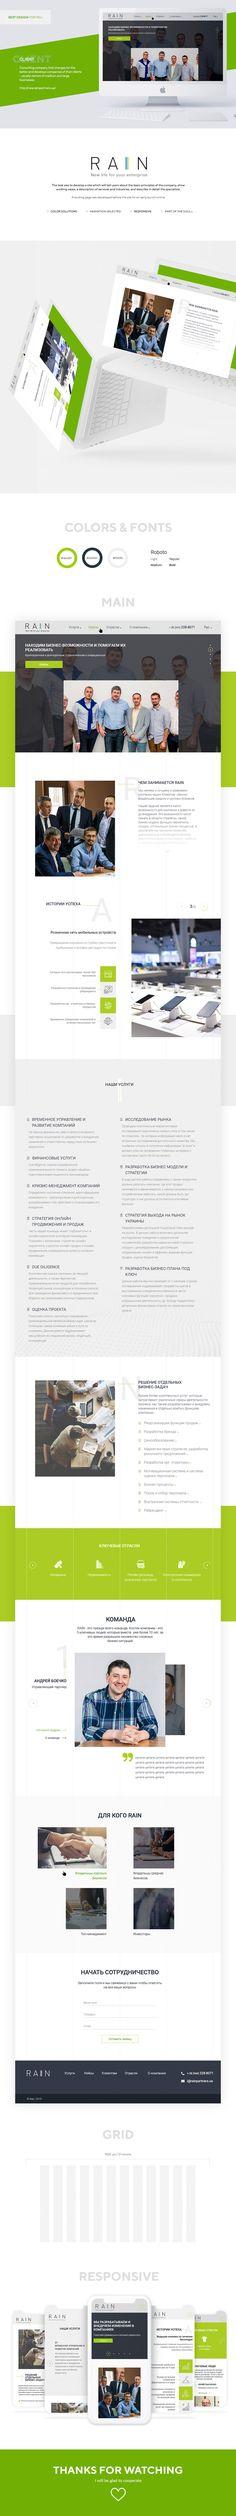 B2b B2c по проектам | Фотографии, видео, логотипы, иллюстрации и брендинг в Behance Infographic, Behance, Infographics, Visual Schedules